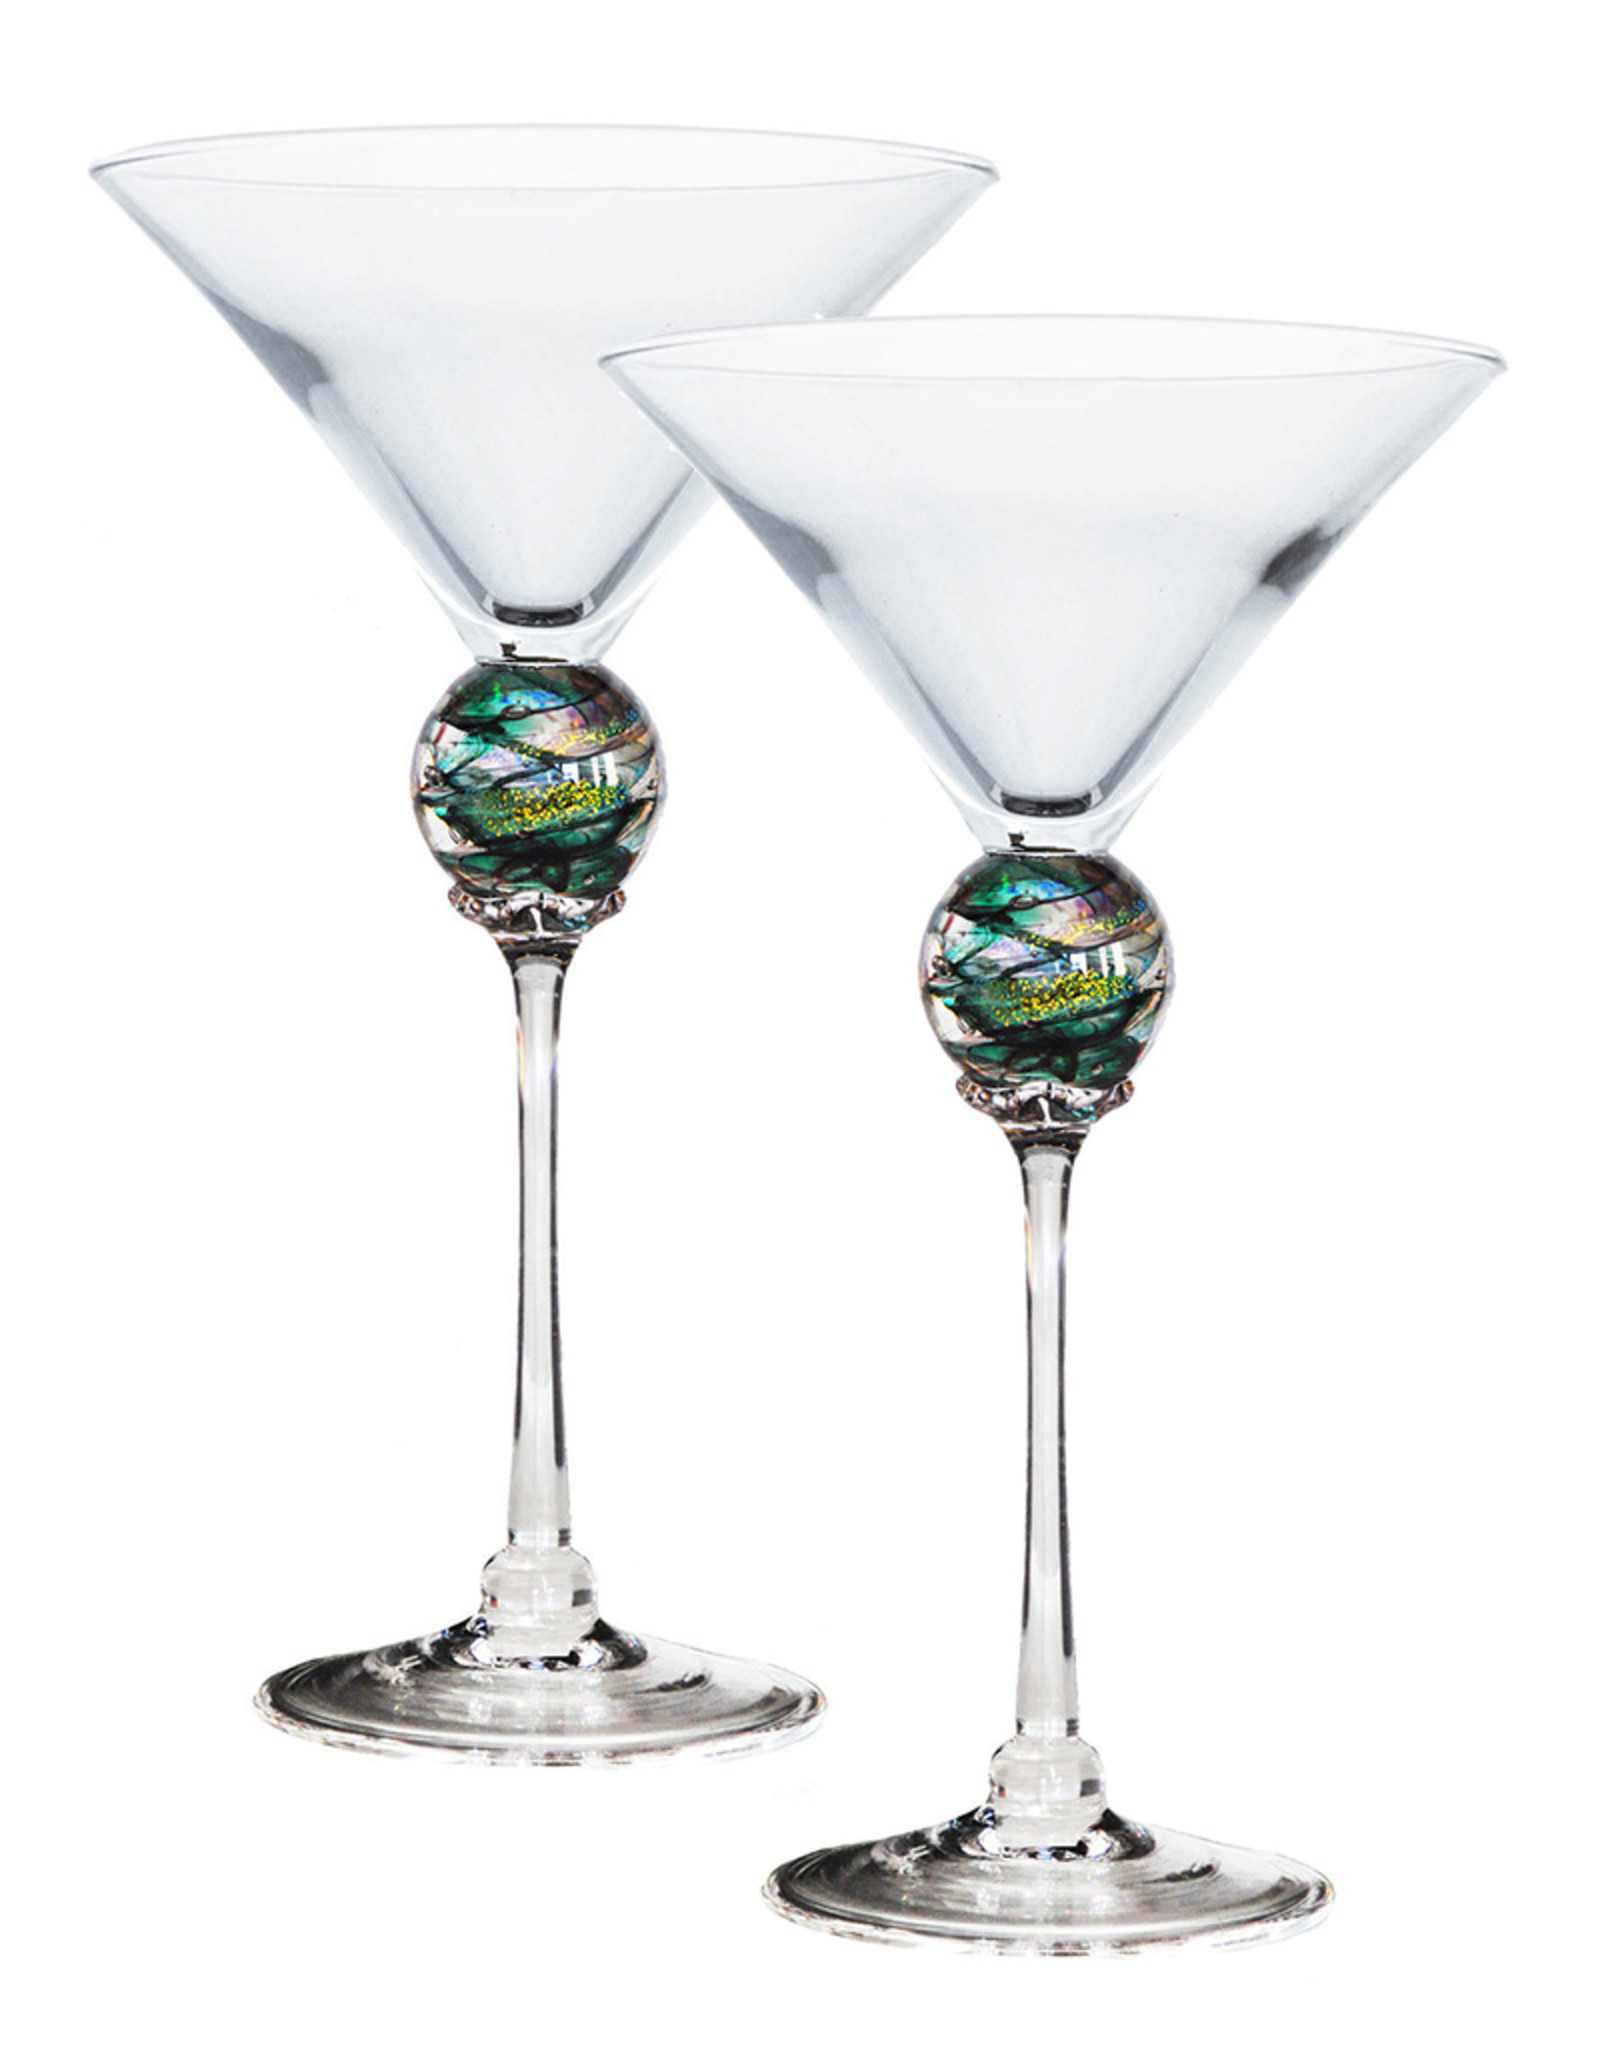 ROMEO GLASS GREEN PLANET MARTINI GLASS